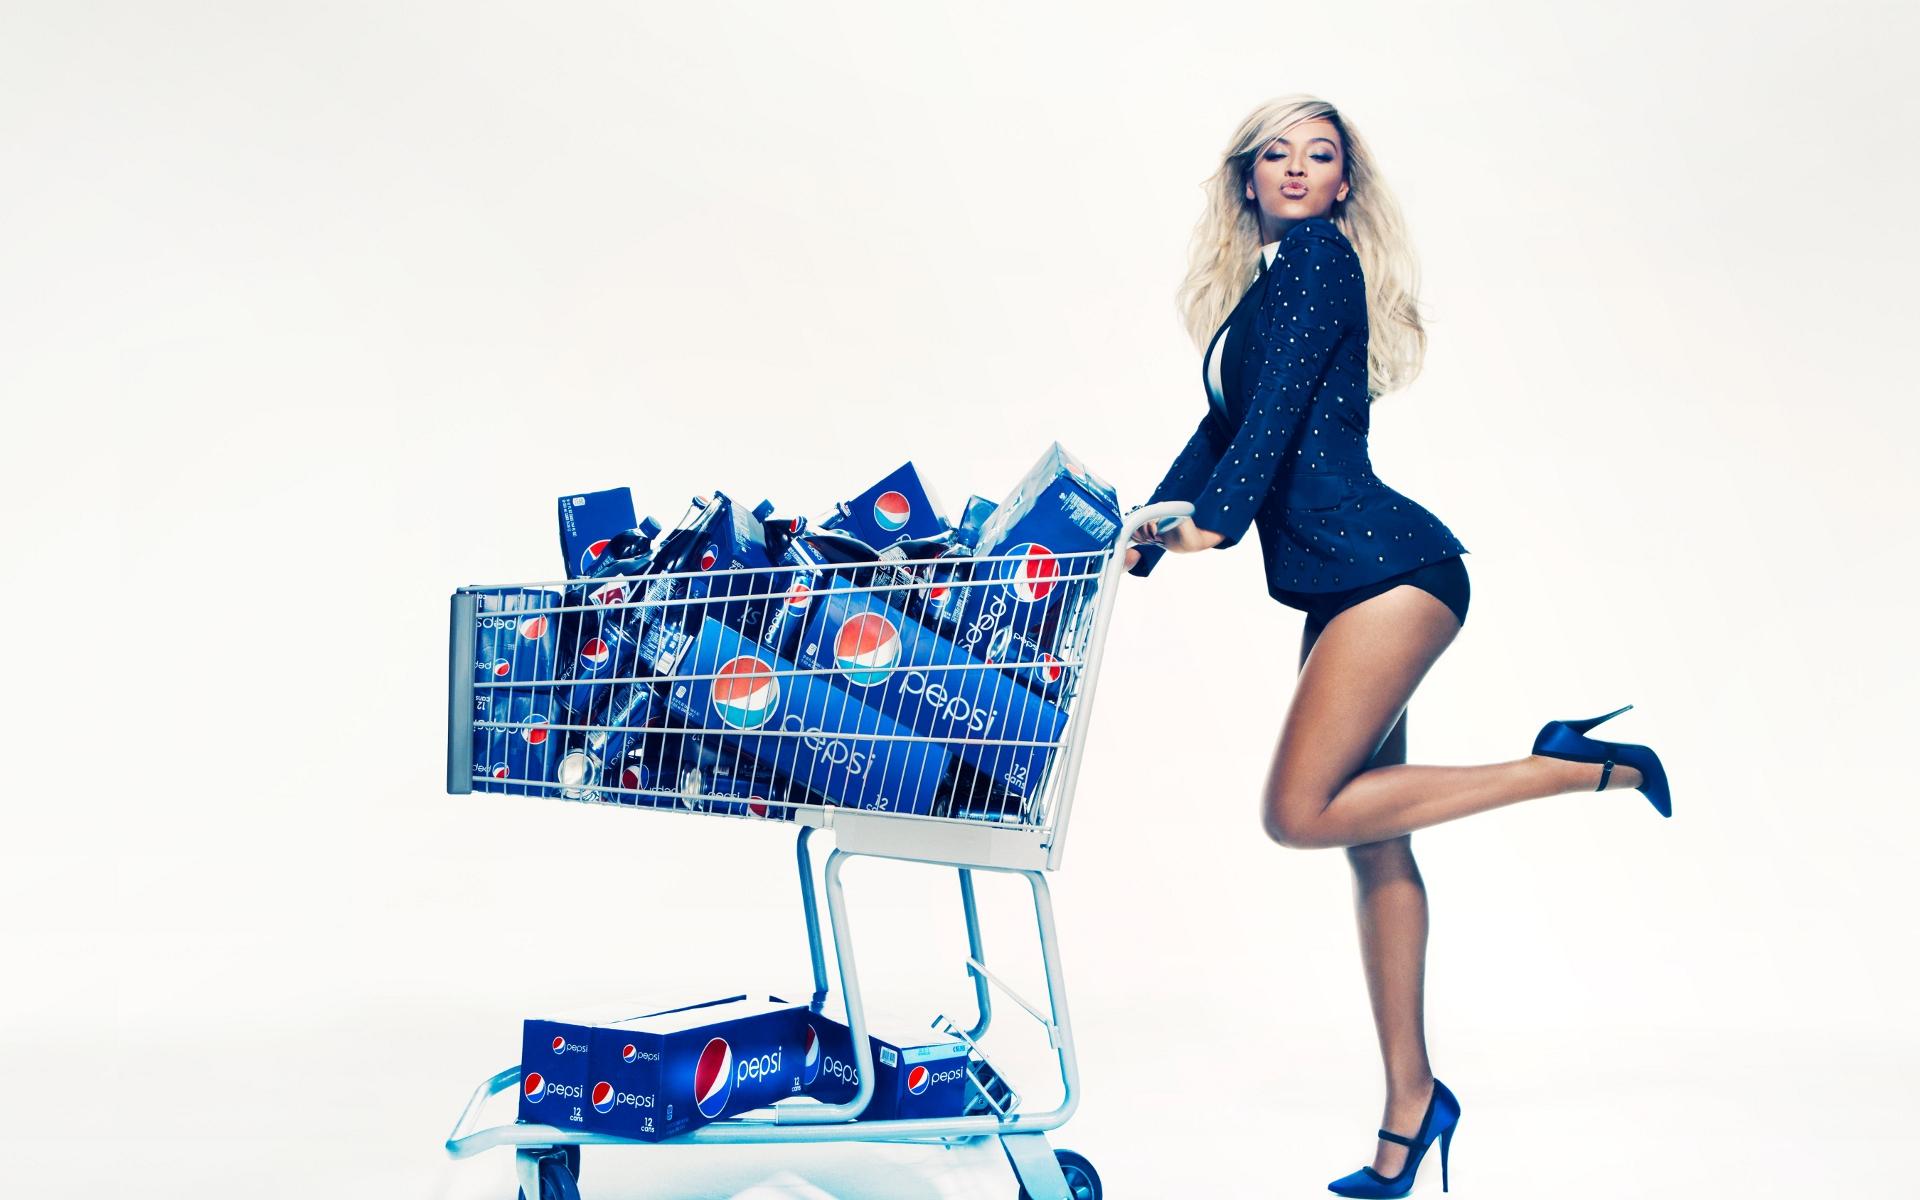 Beyoncé for Pepsi